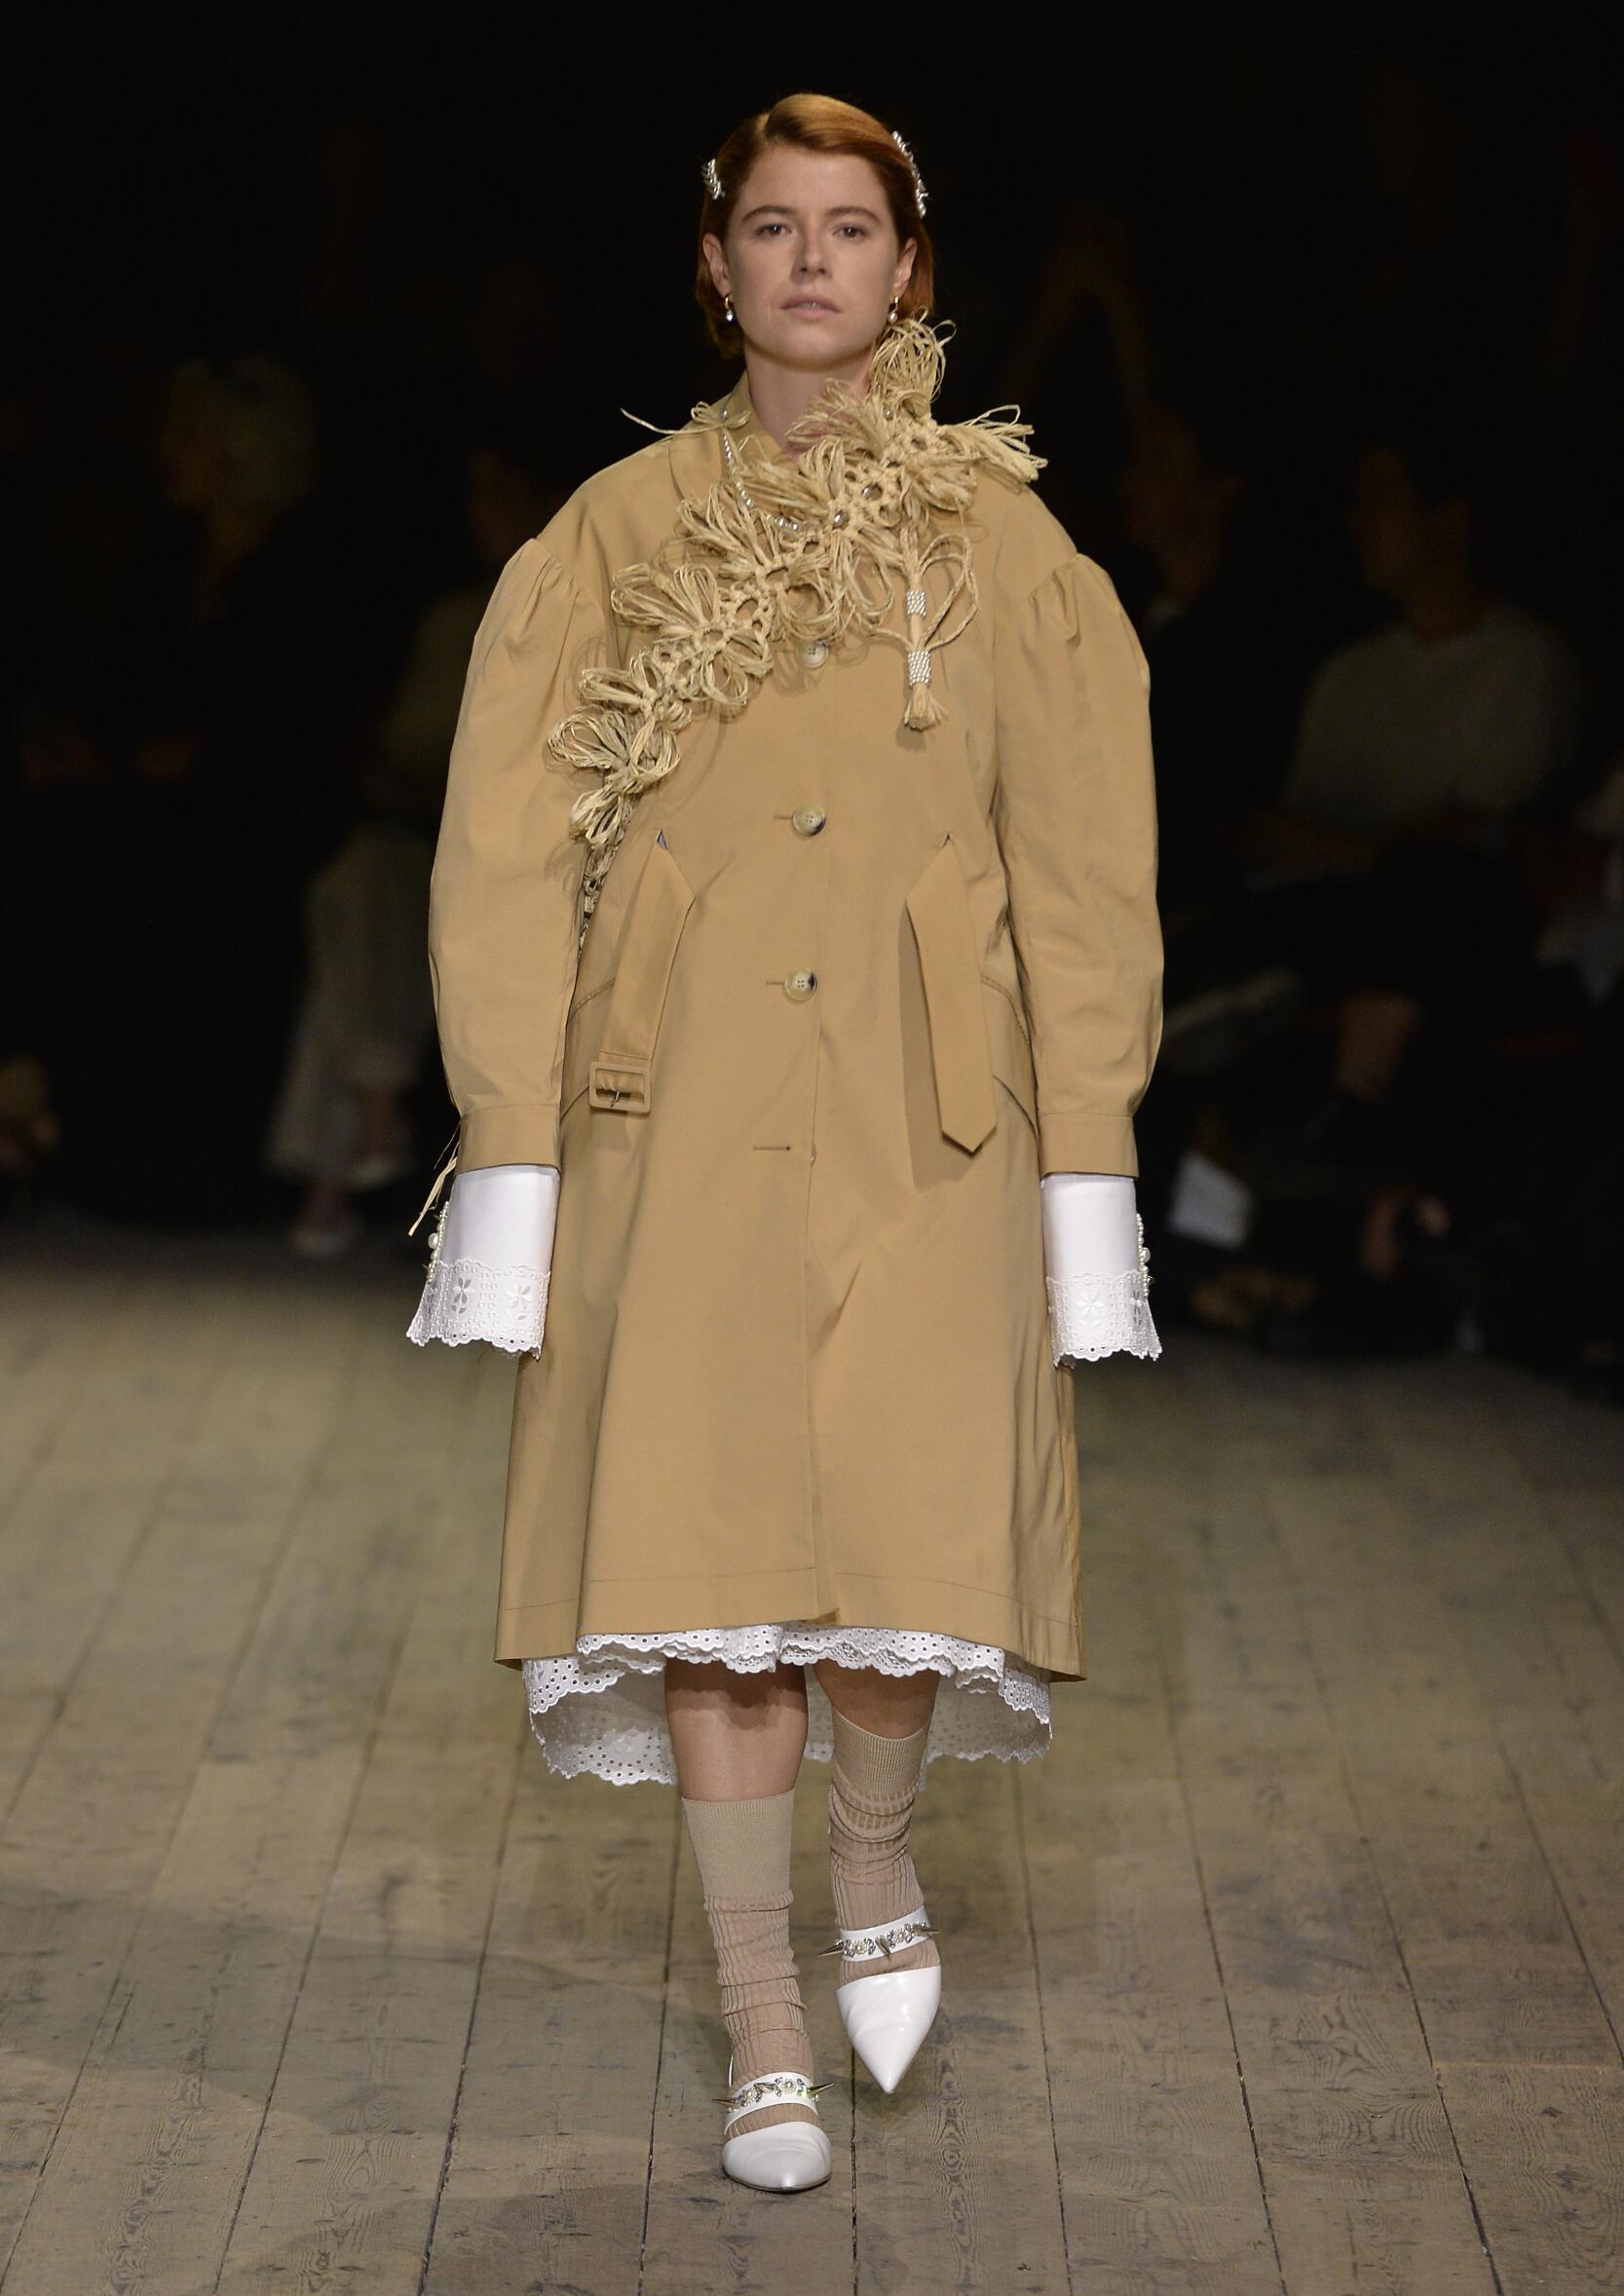 Runway Simone Rocha Spring Summer 2020 Women's Collection London Fashion Week